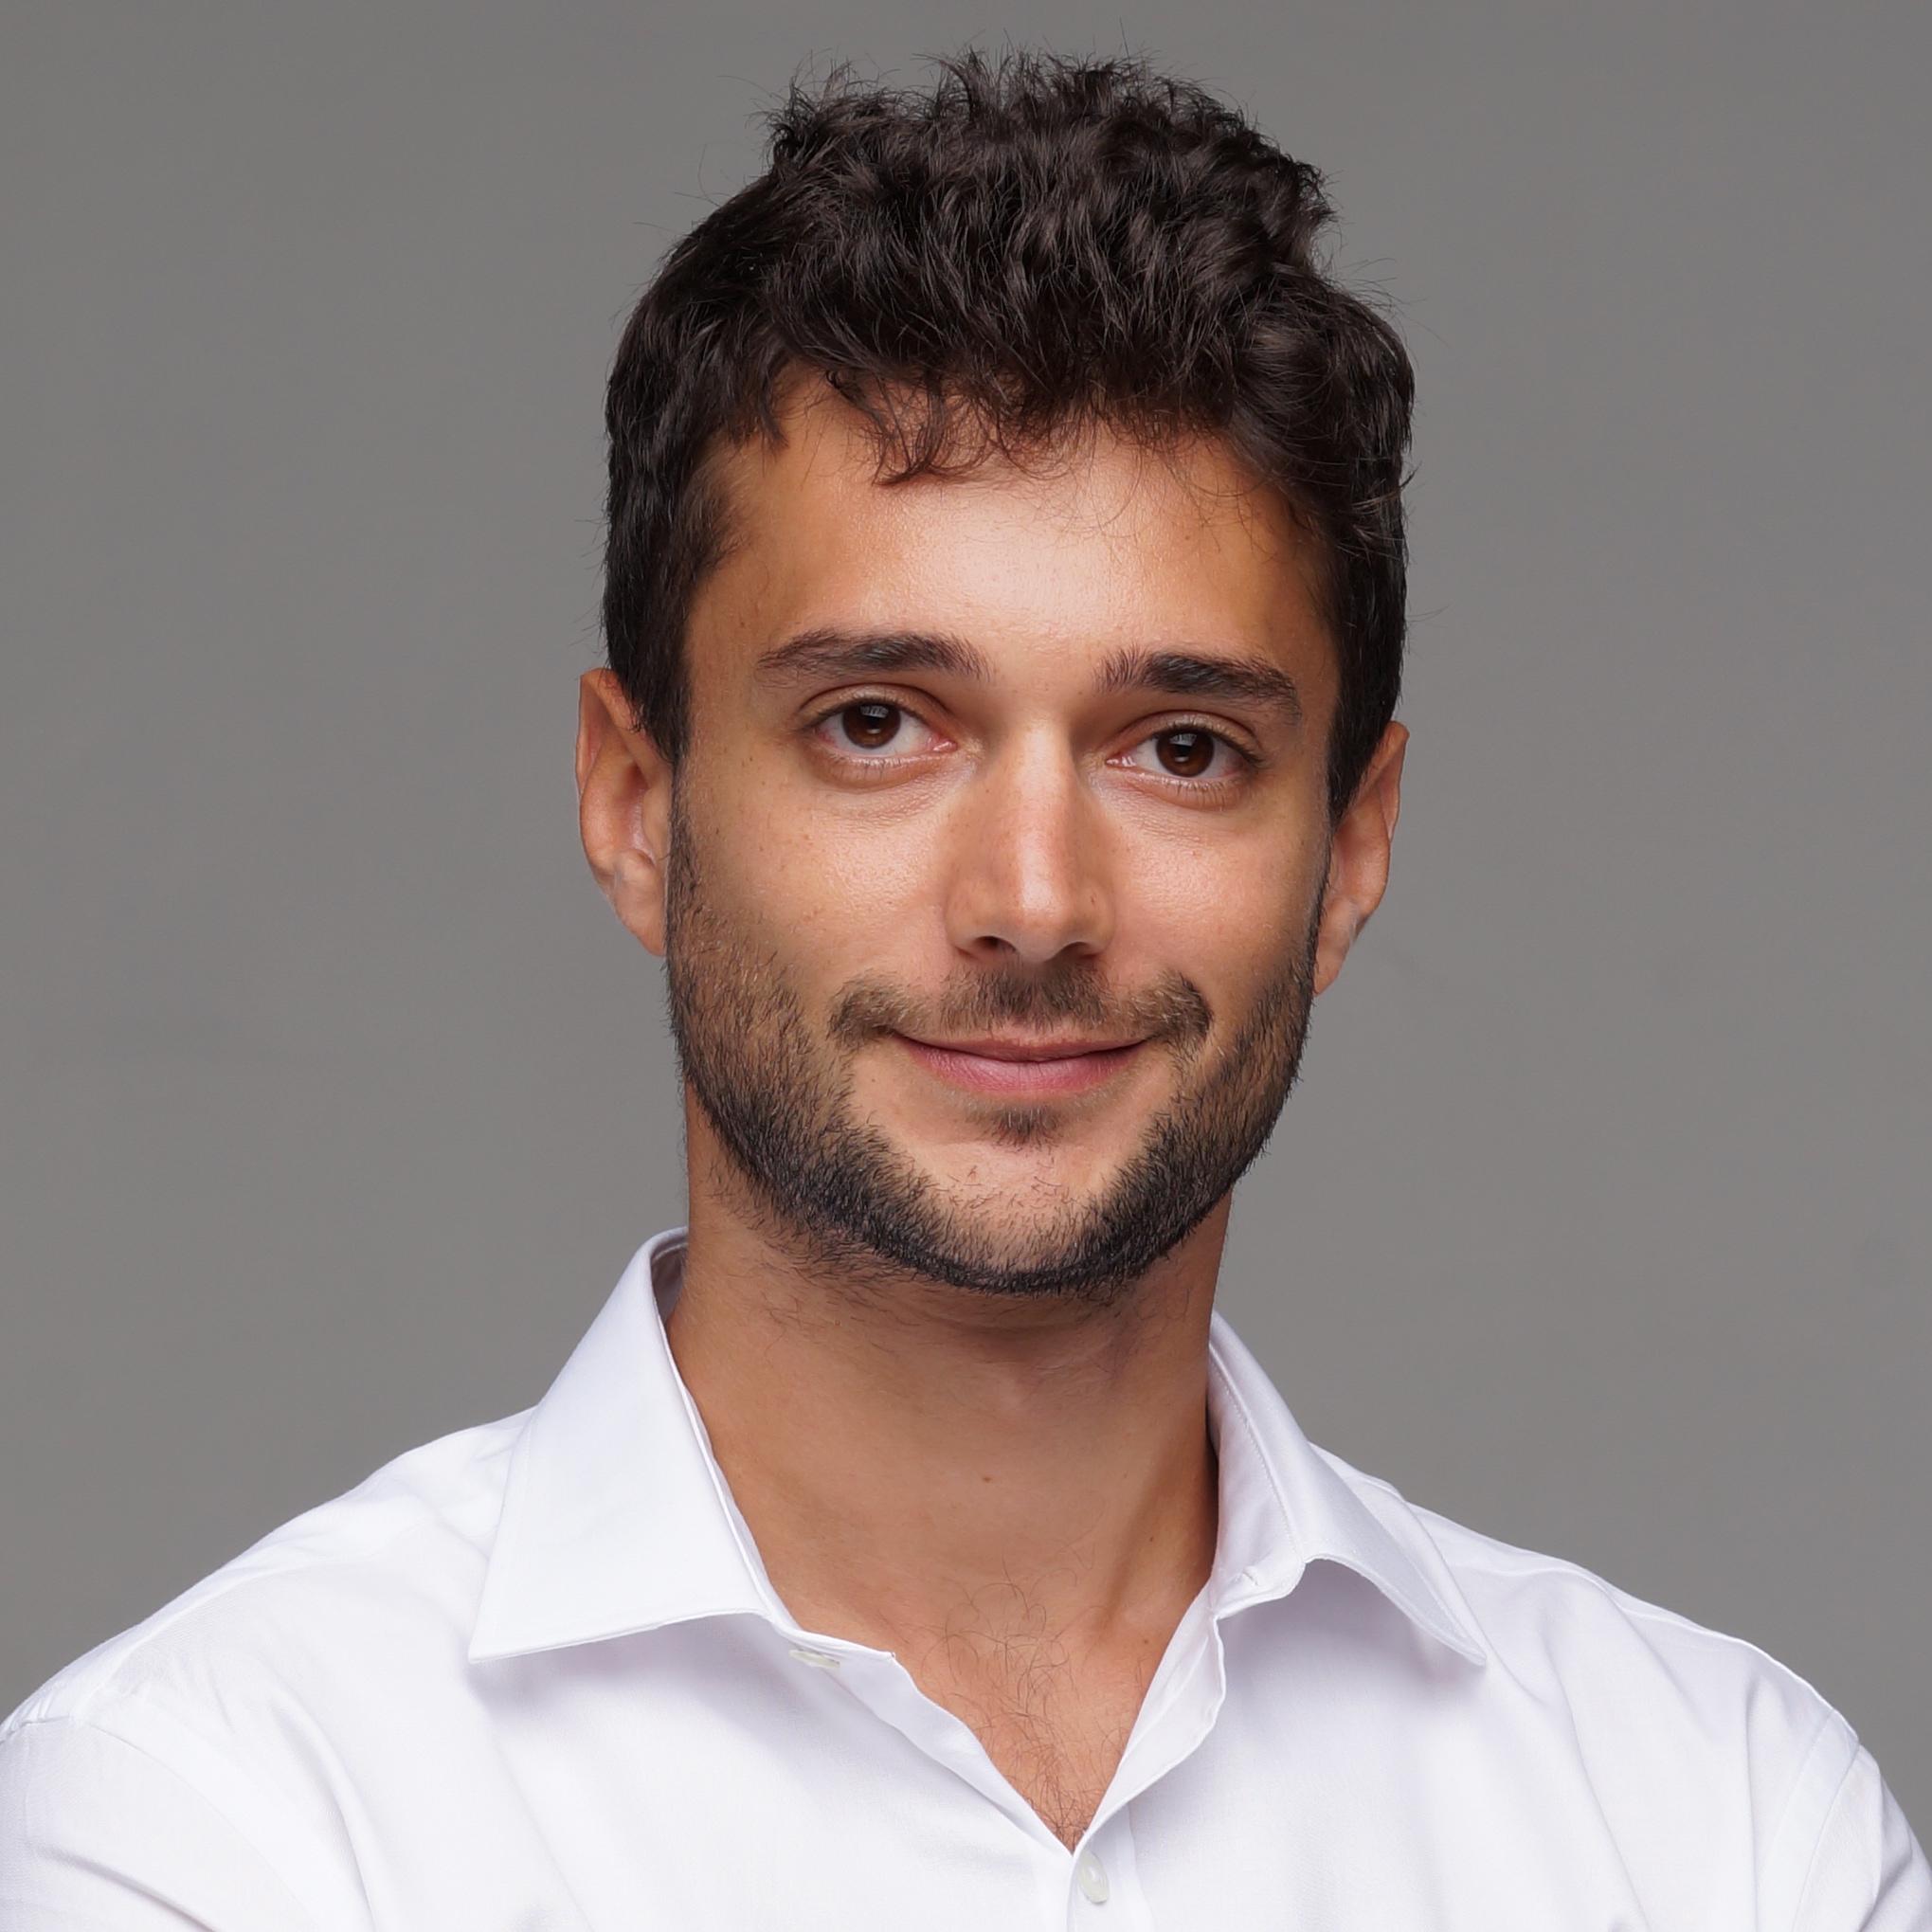 Stéphane Maarek